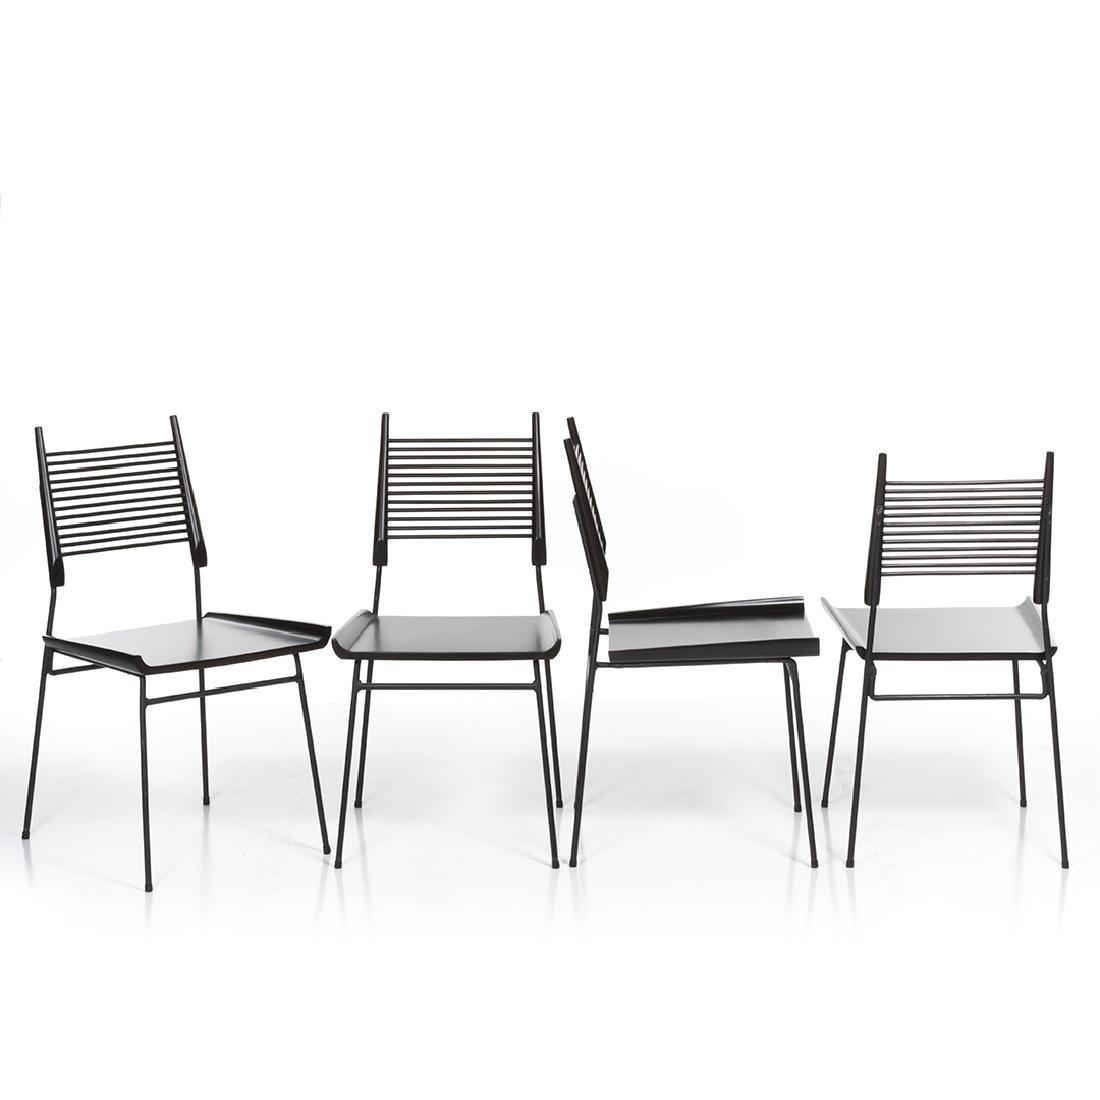 Paul McCobb Shovel Chairs (4) - 2